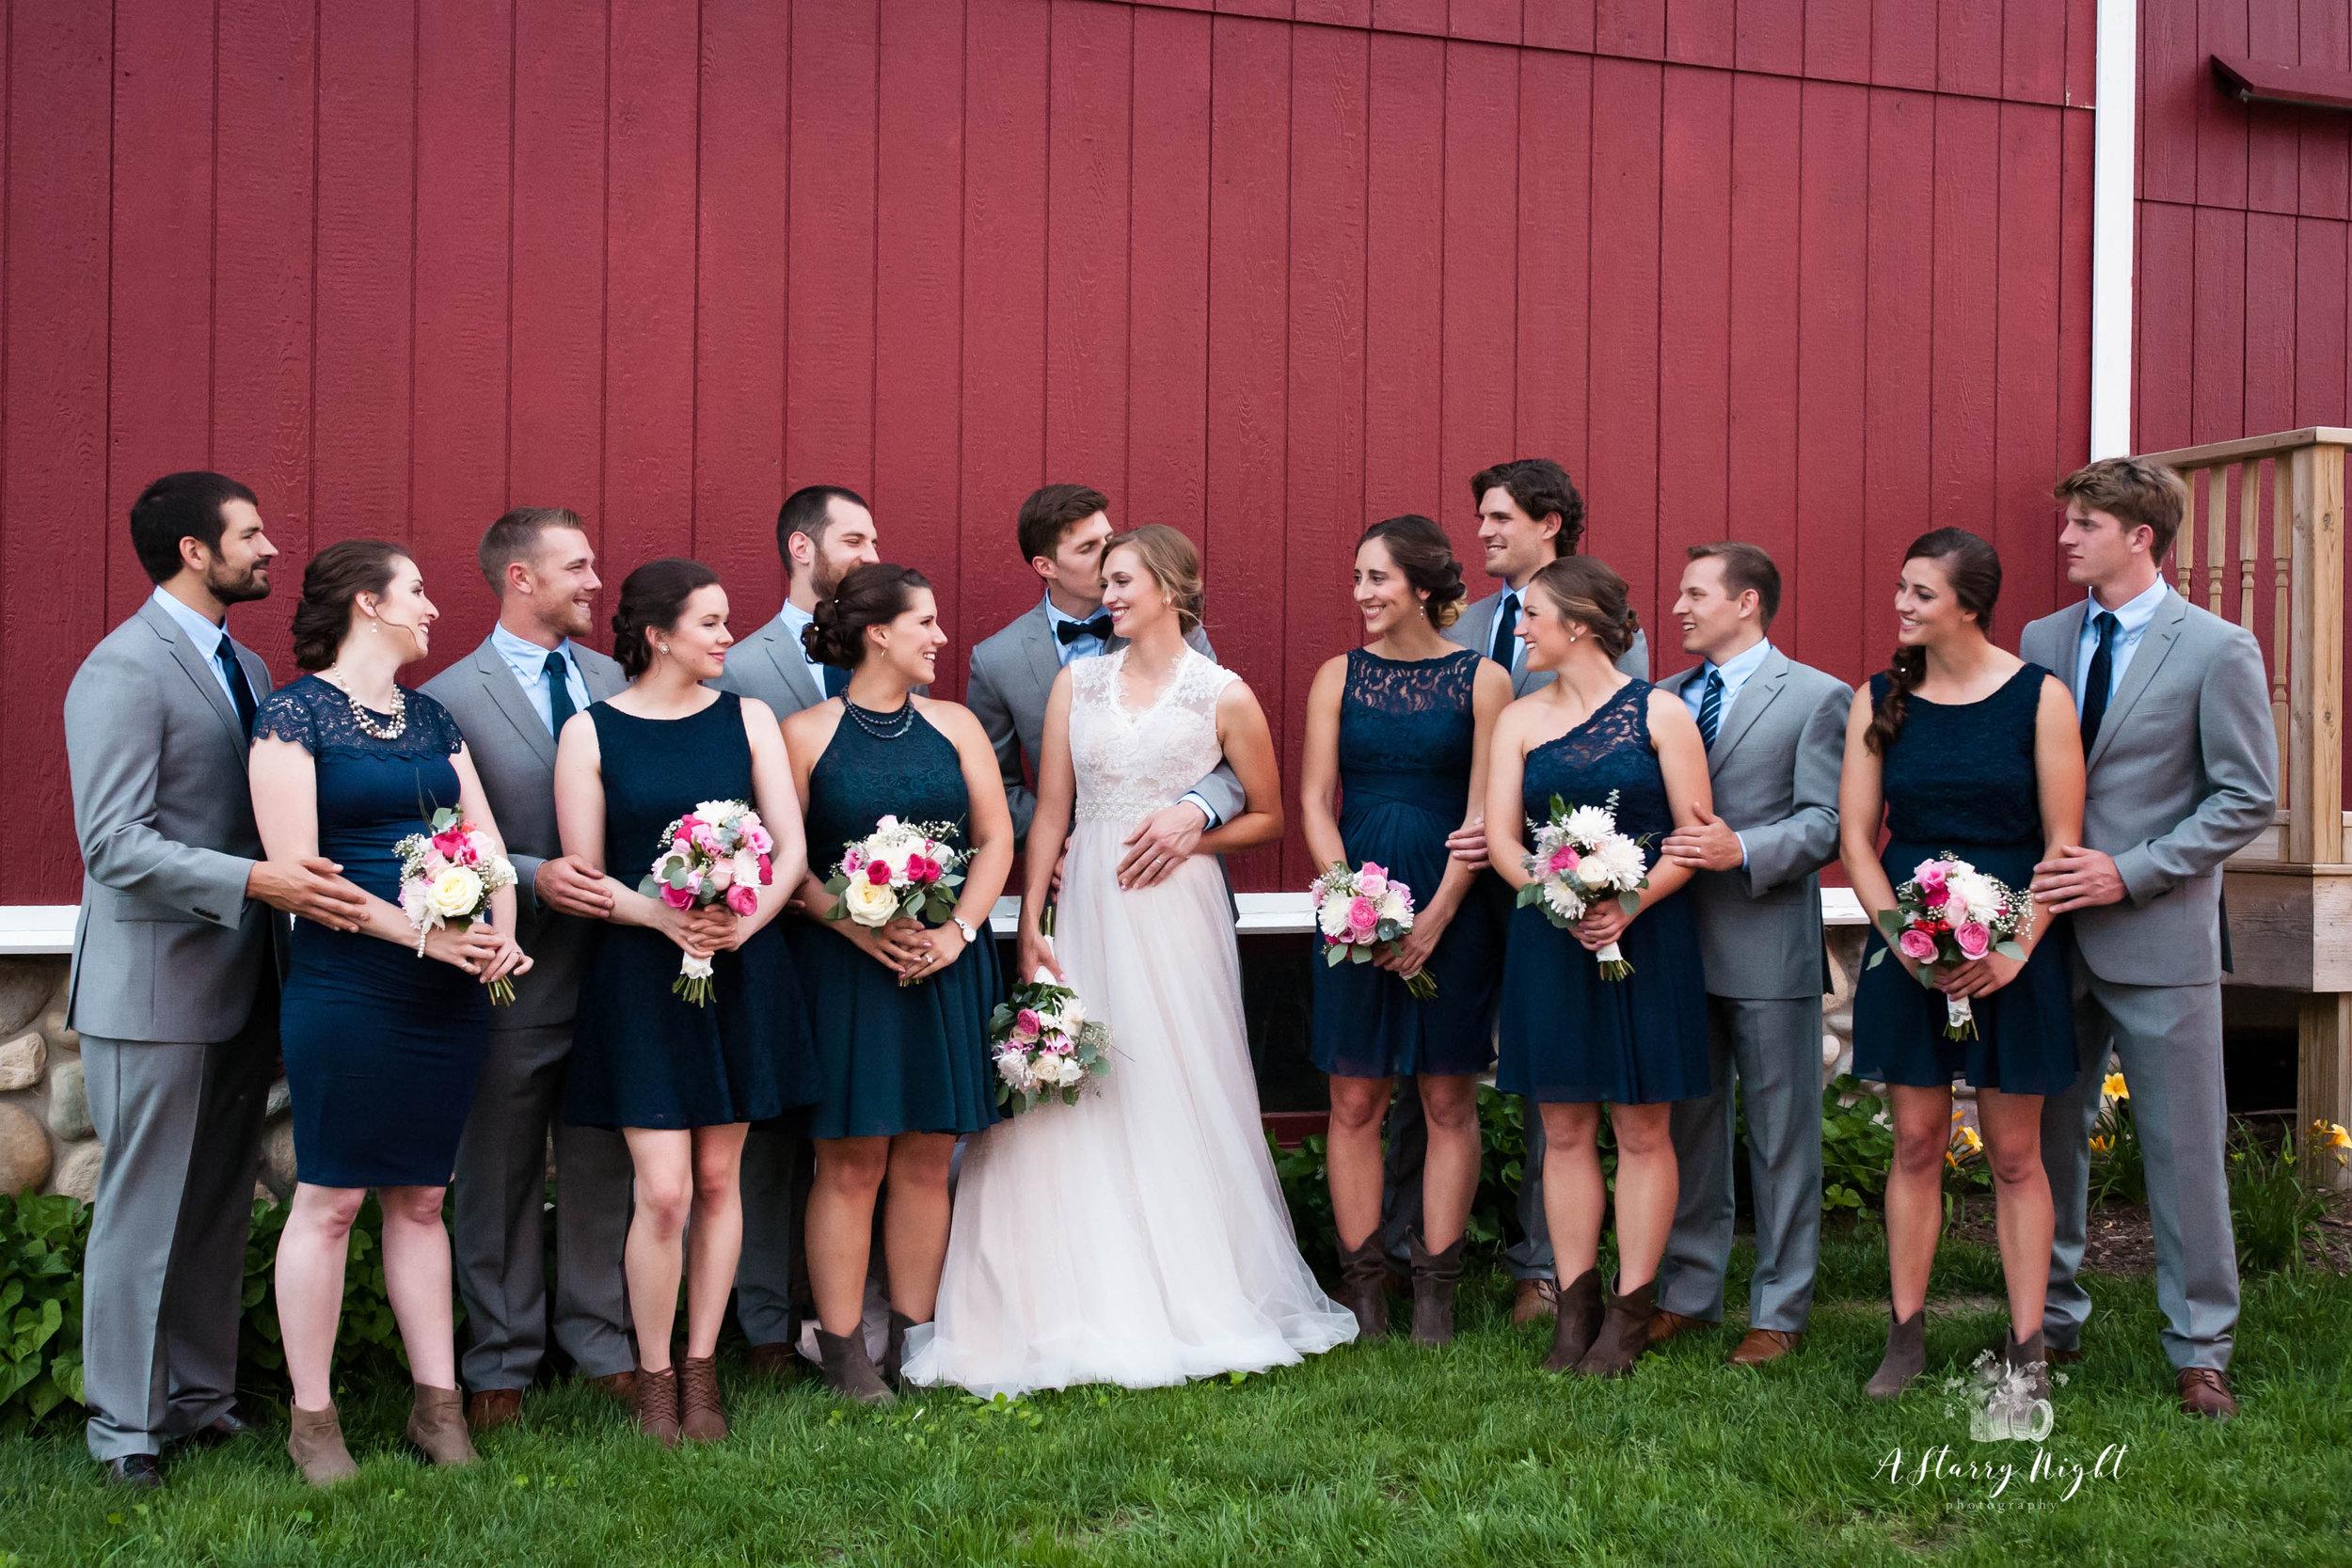 Bride-Groom-Bridal-Party-Group-Shot-WEB.jpg